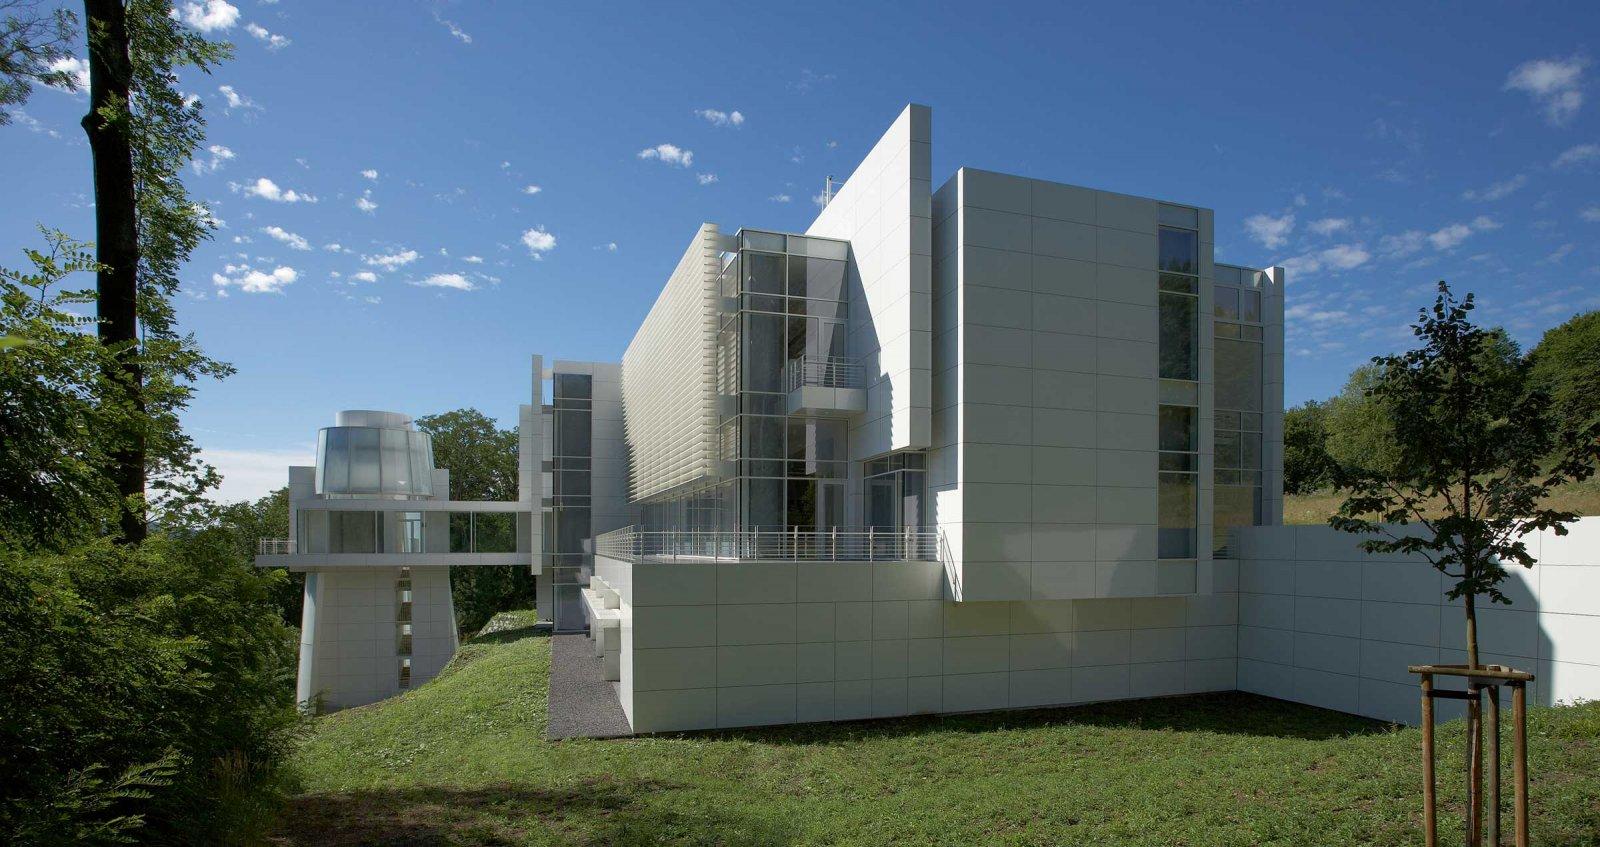 The new building by Richard Meier © Arp Museum Bahnhof Rolandseck, photo: Horst Bernhard